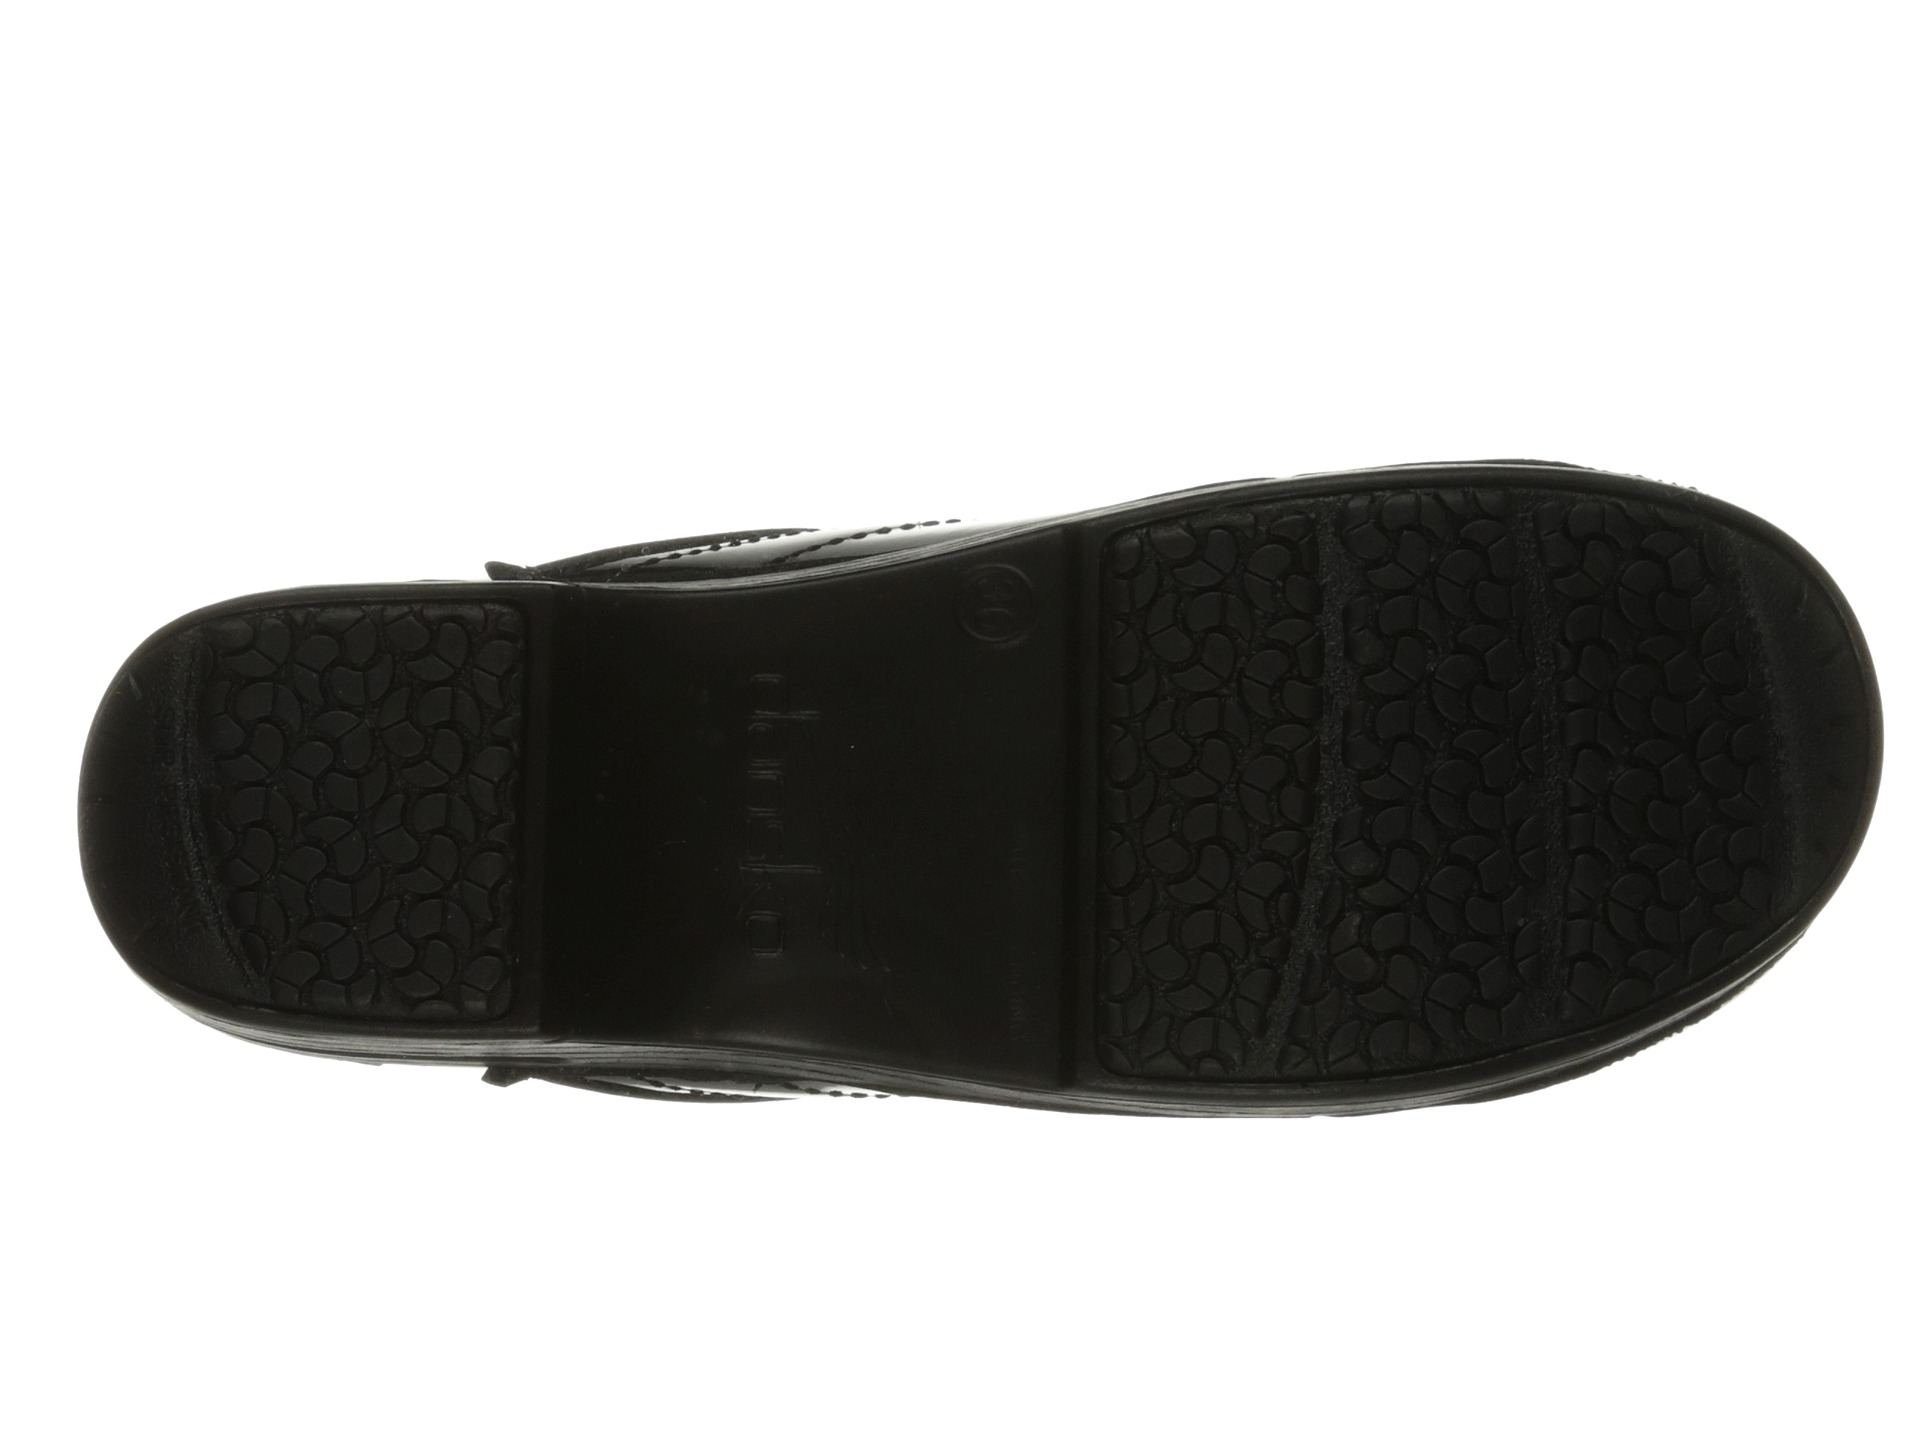 Dansko Shoes Benefits